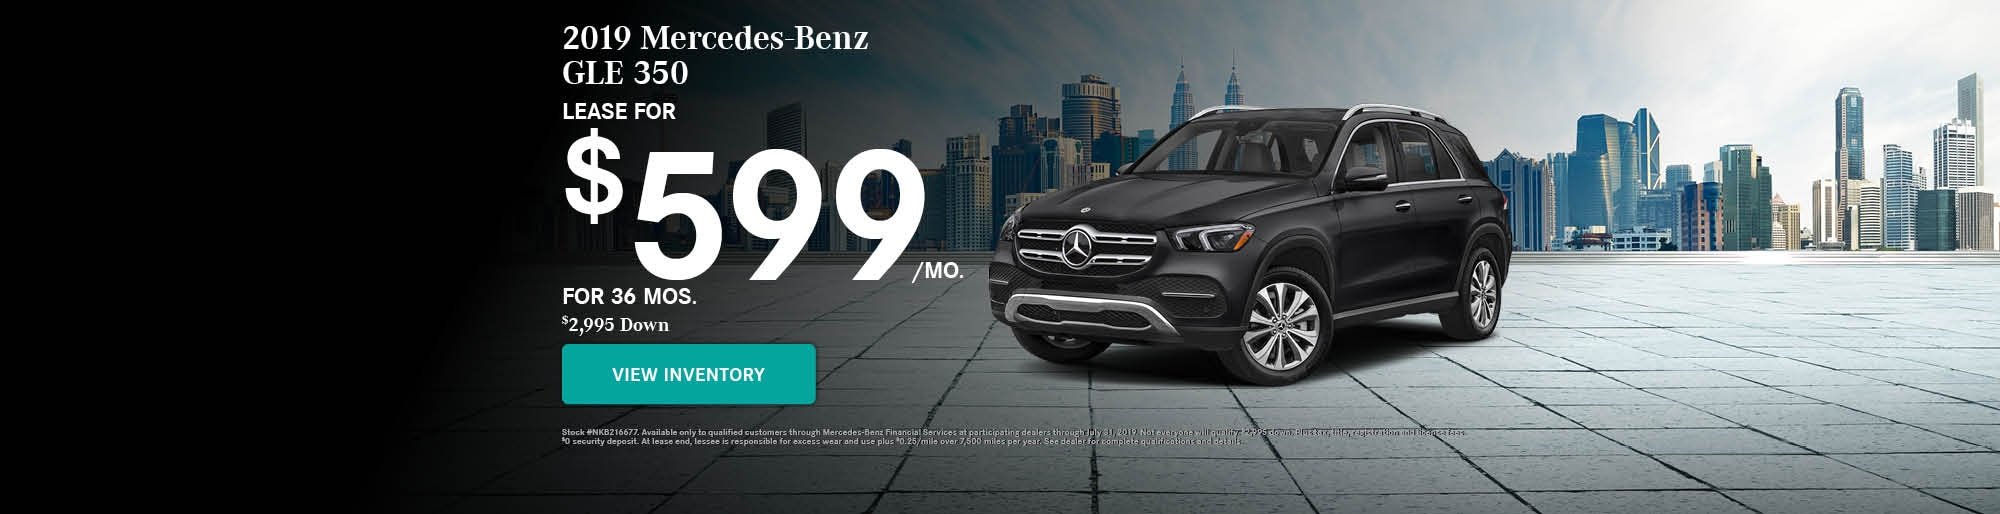 Mercedes Benz Lease Deals 0 Down >> Mercedes Benz Of Walnut Creek 1 Volume Dealer In N California